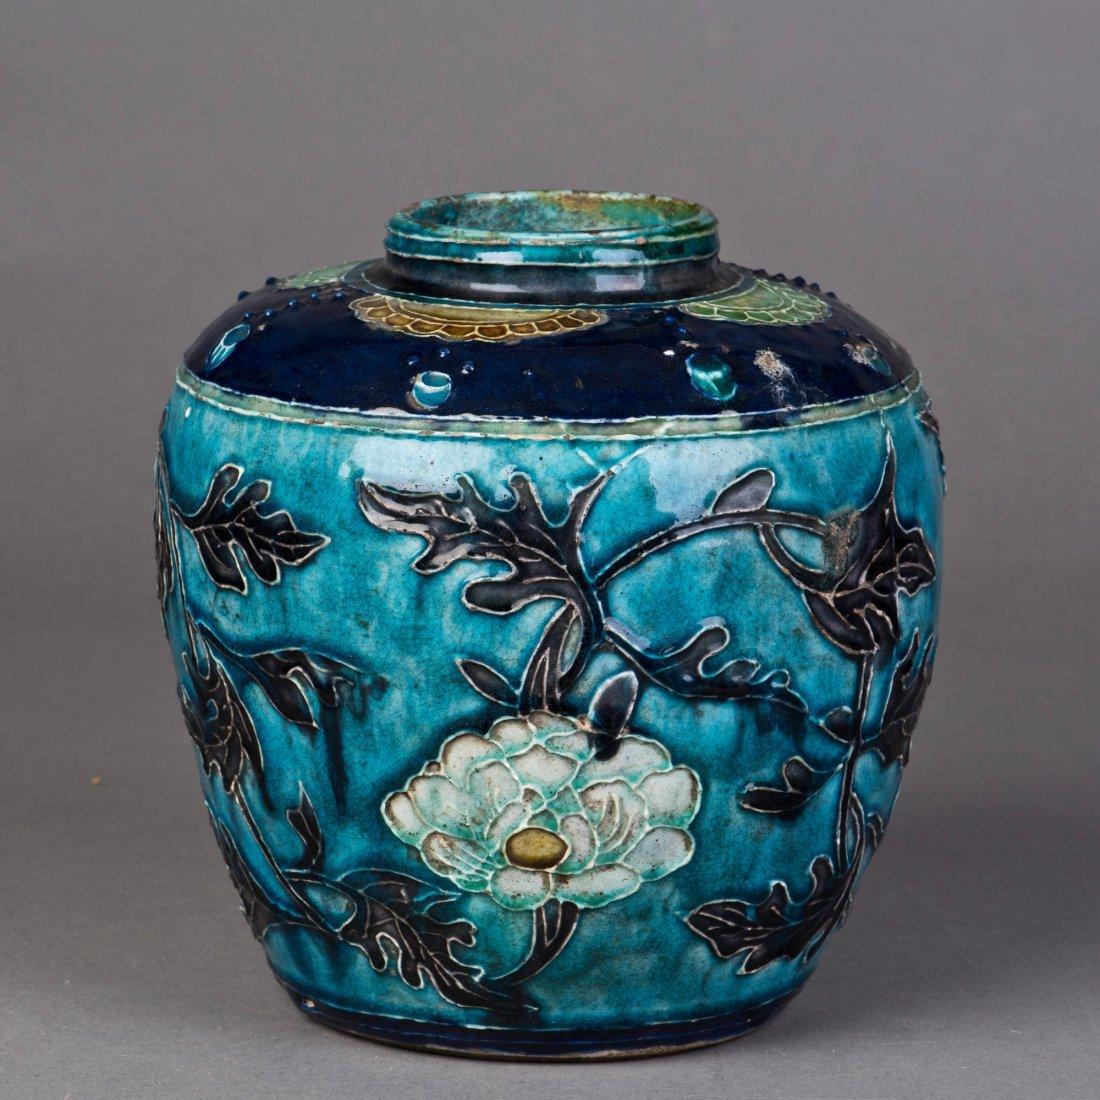 A COBALT GLAZED PORCELAIN JAR WITH FLOWER IN RELIEF